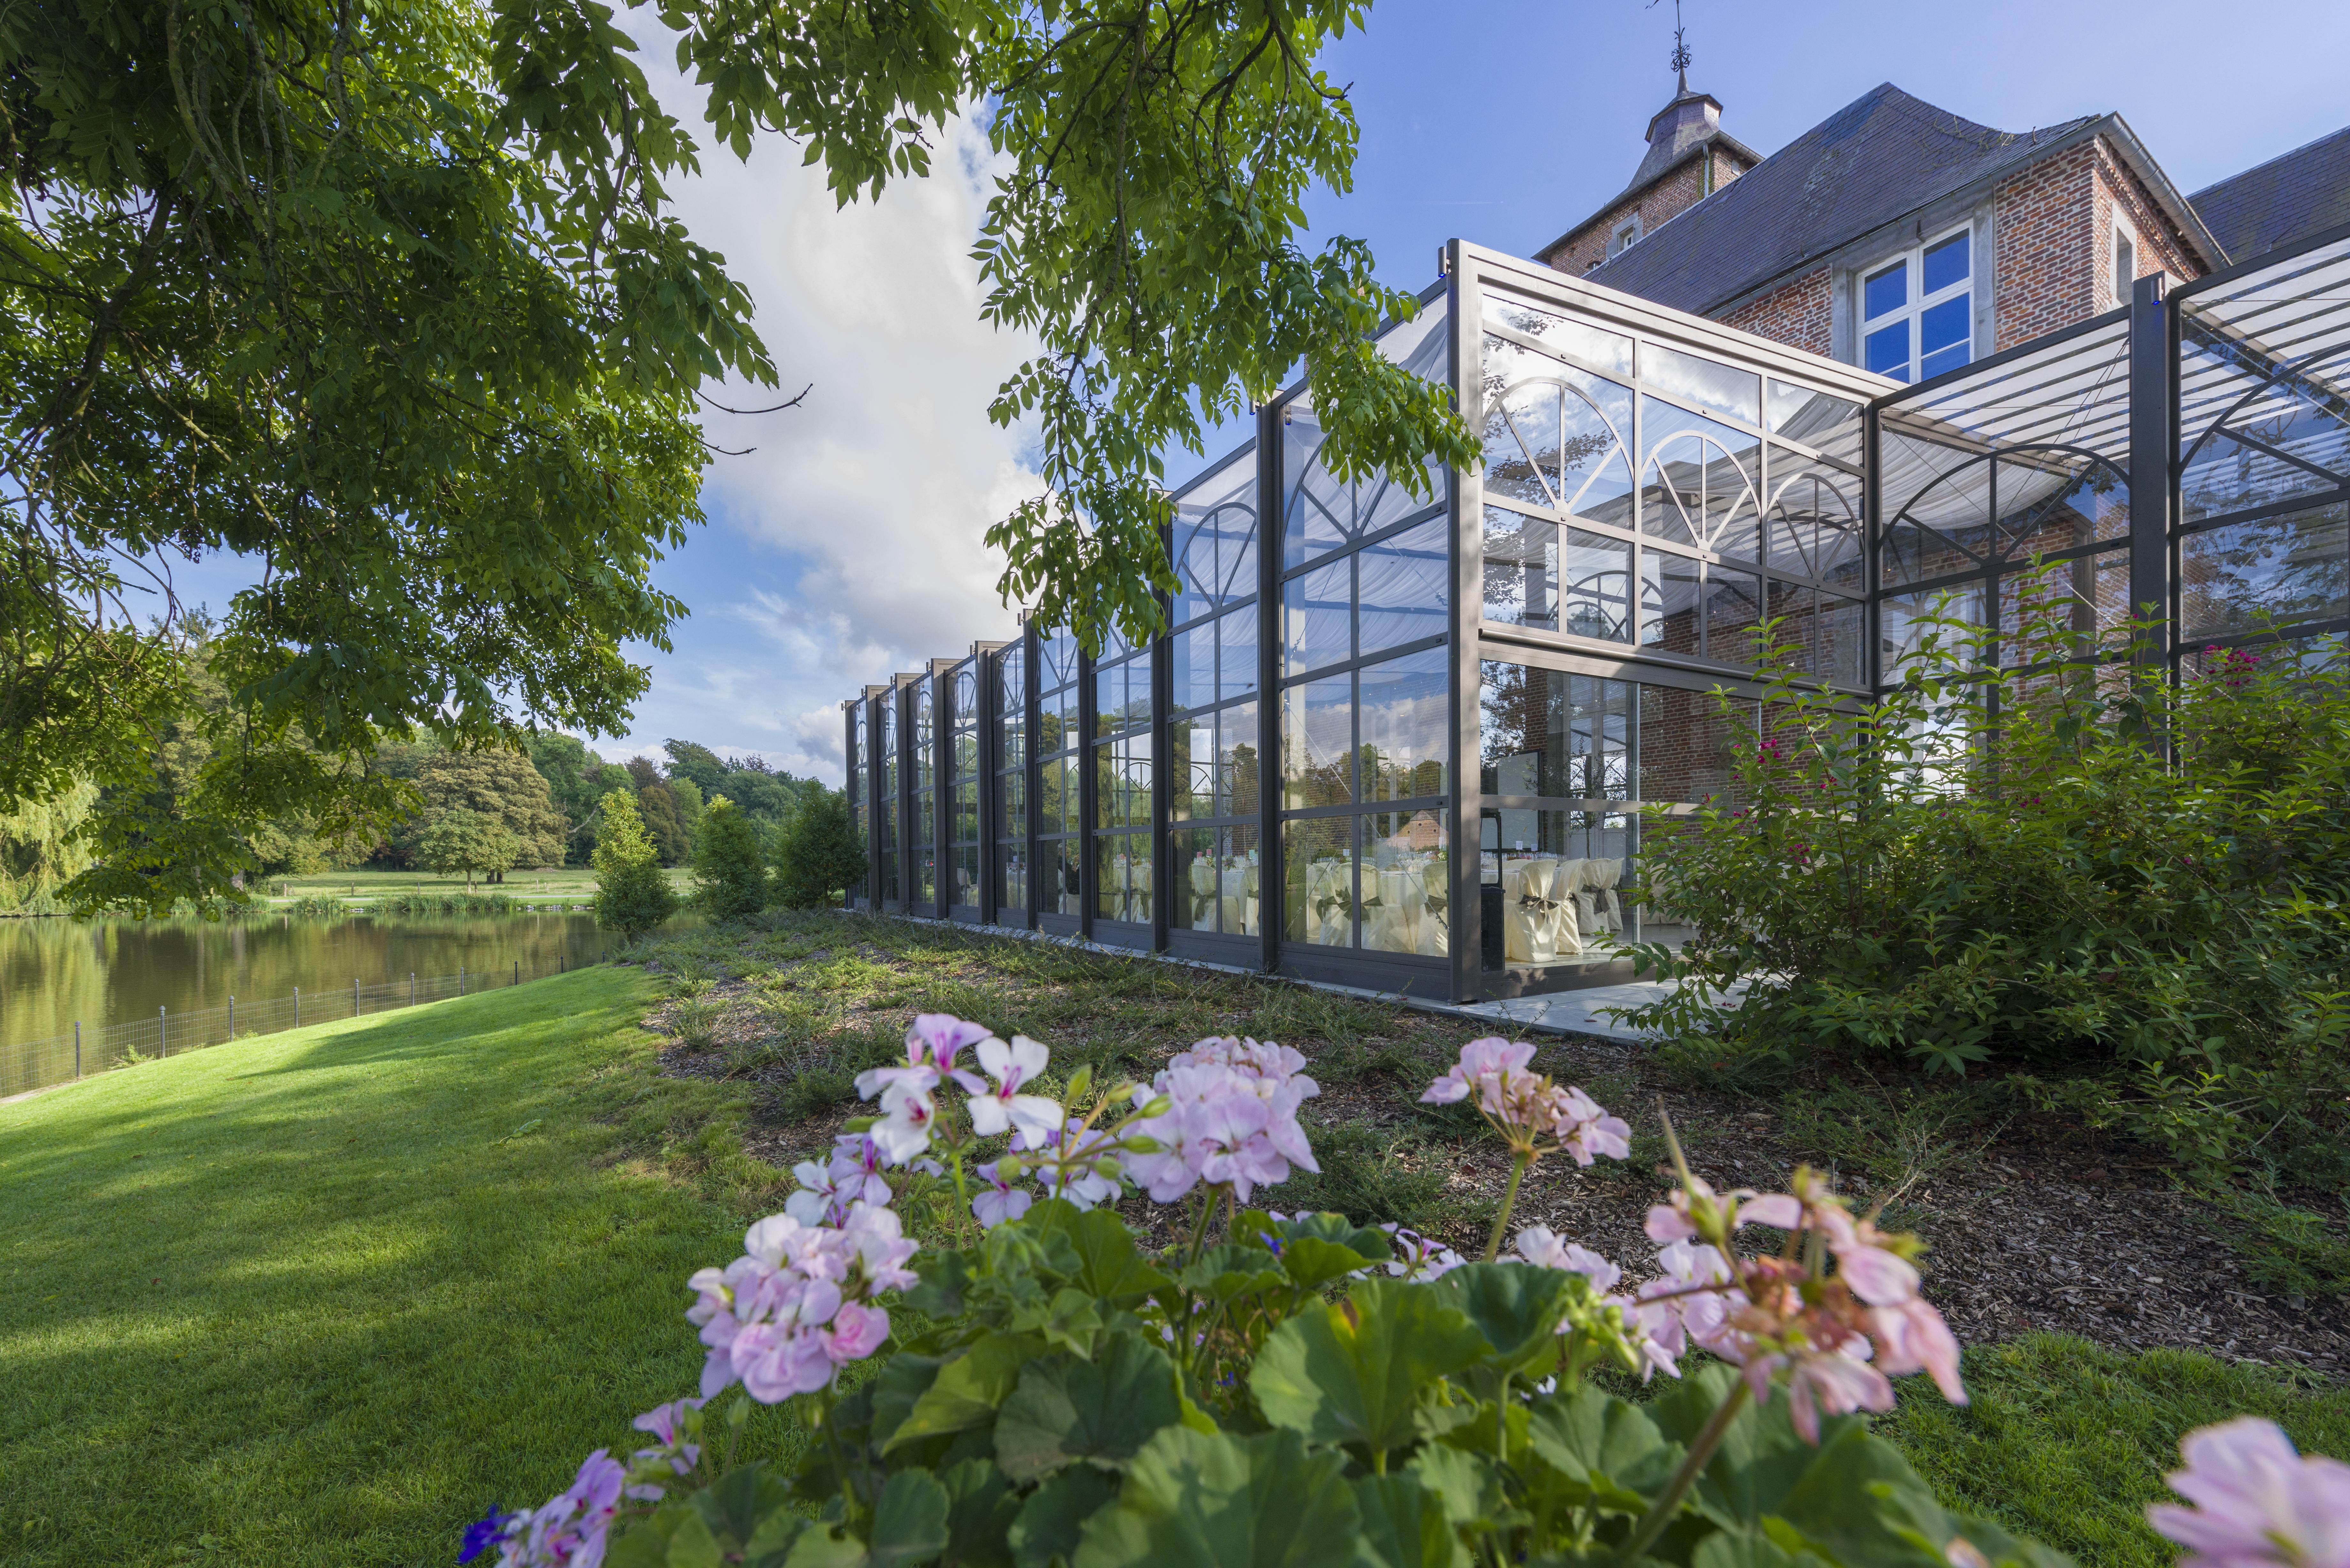 Terrassen Veranda de terrasoverkapping verandair